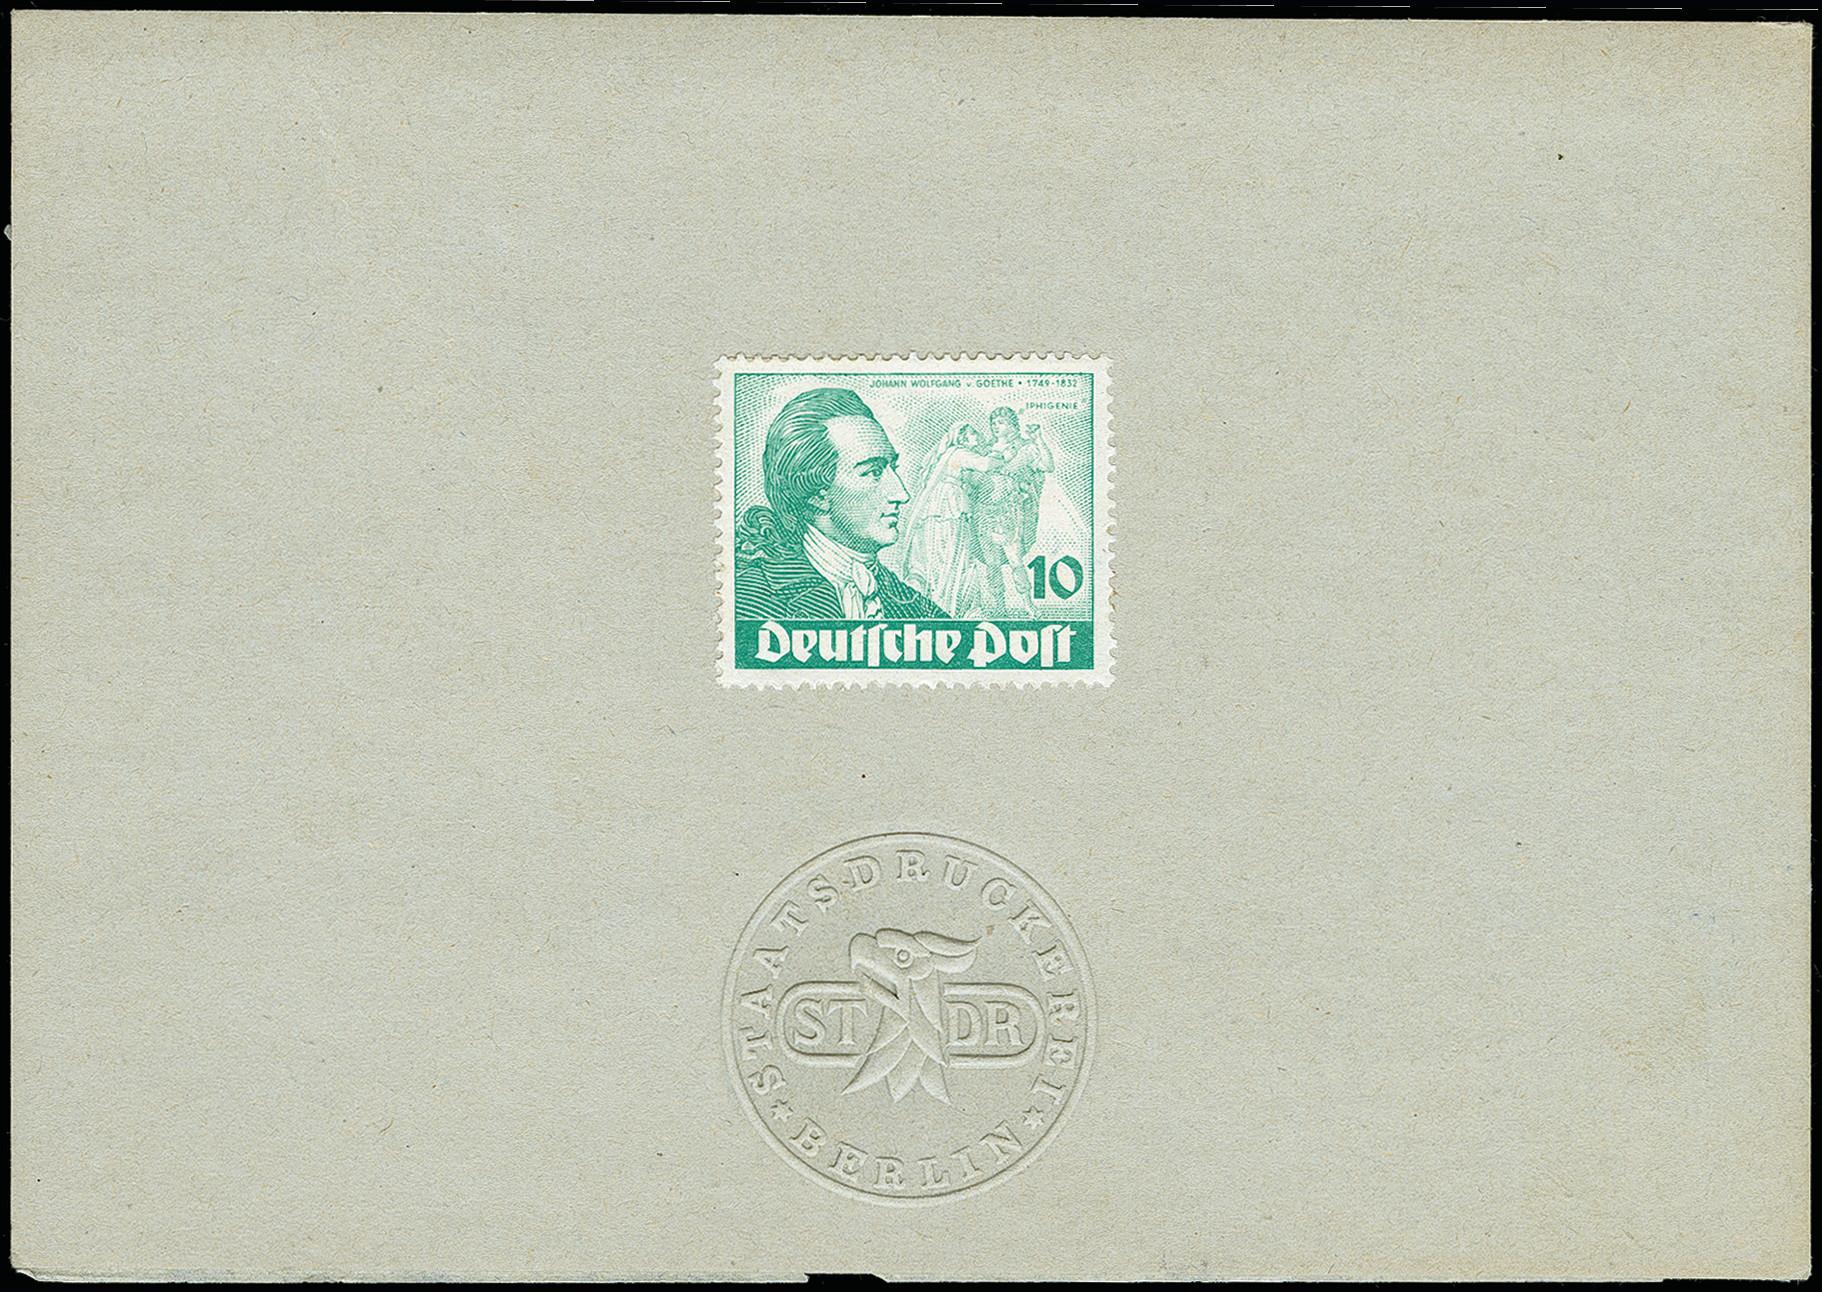 Lot 2364 - germany after 1945 berlin -  Heinrich Koehler Auktionen 373rd Heinrich Köhler auction - Day 4